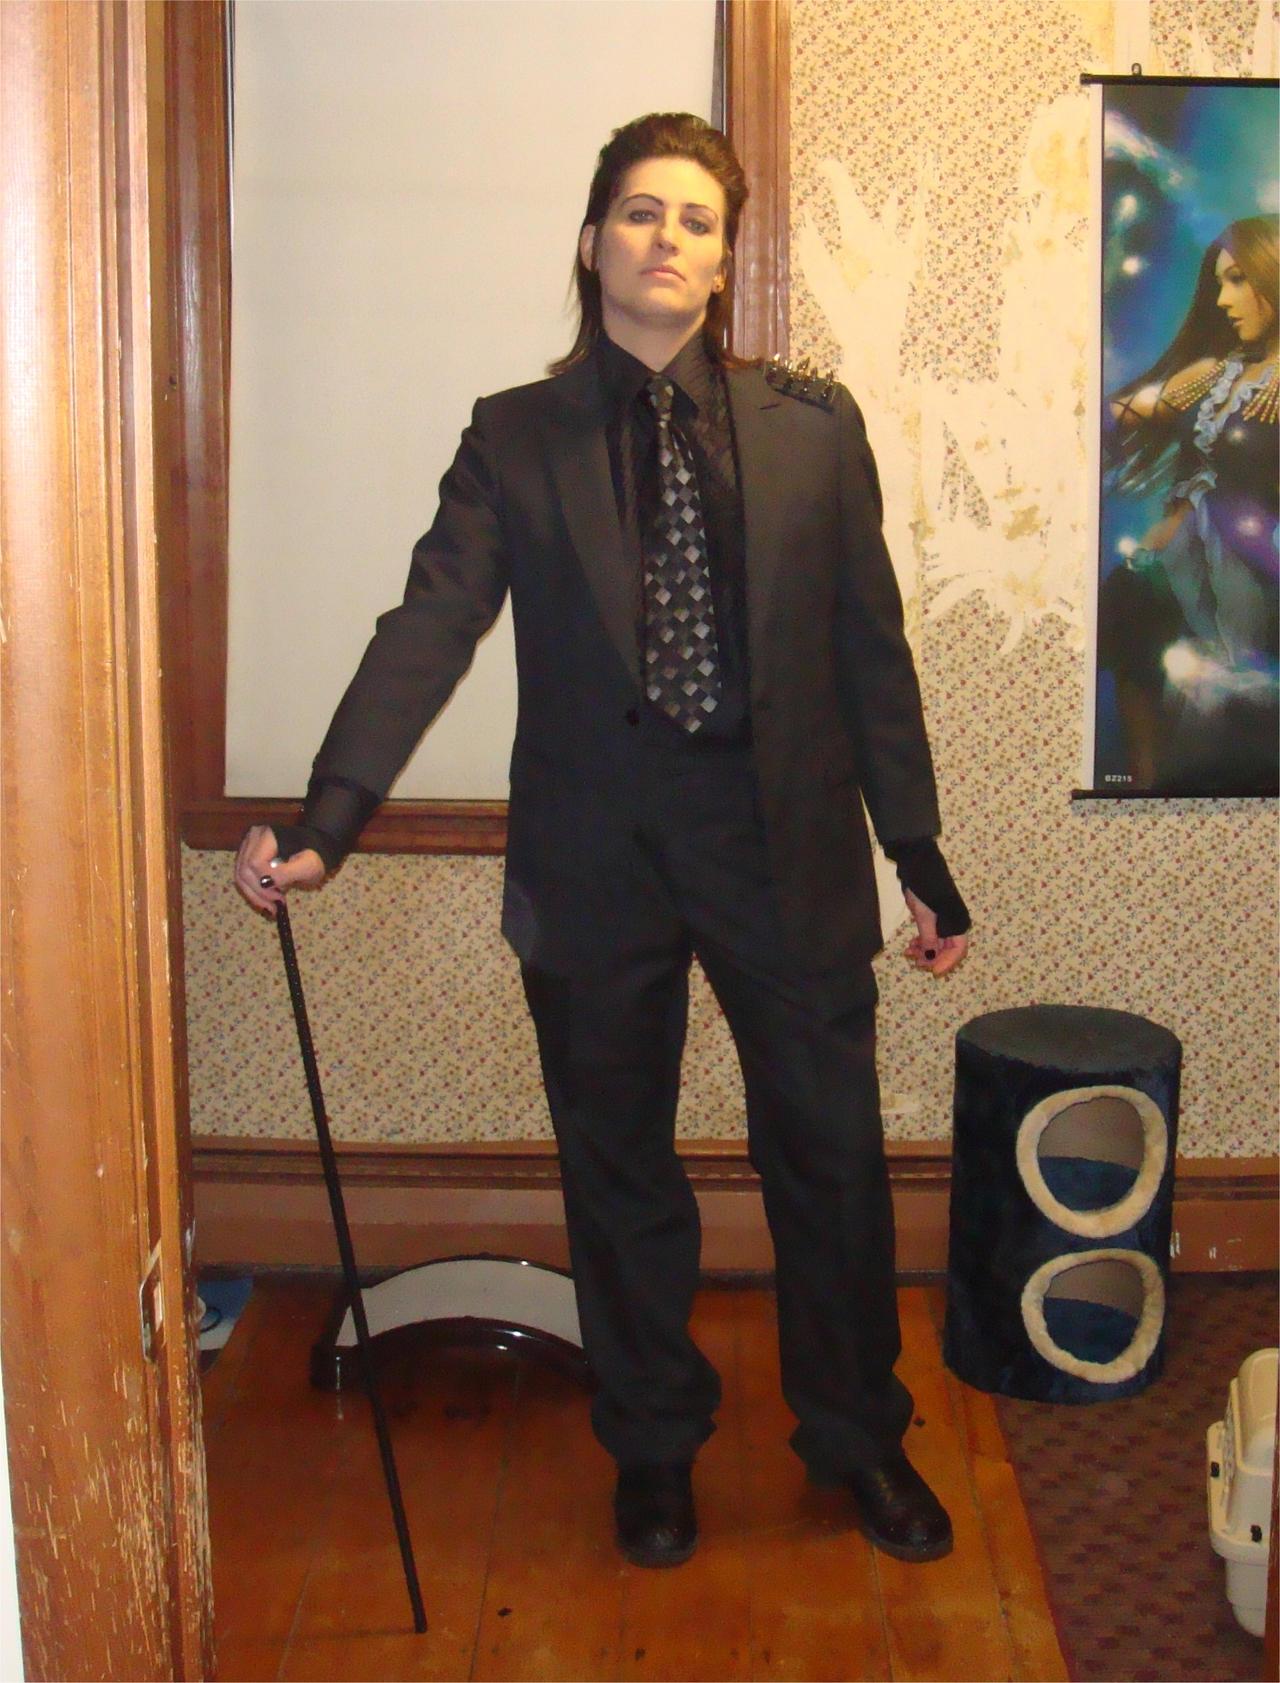 Adam Lambert in Drag Adam Lambert Drag 1 by